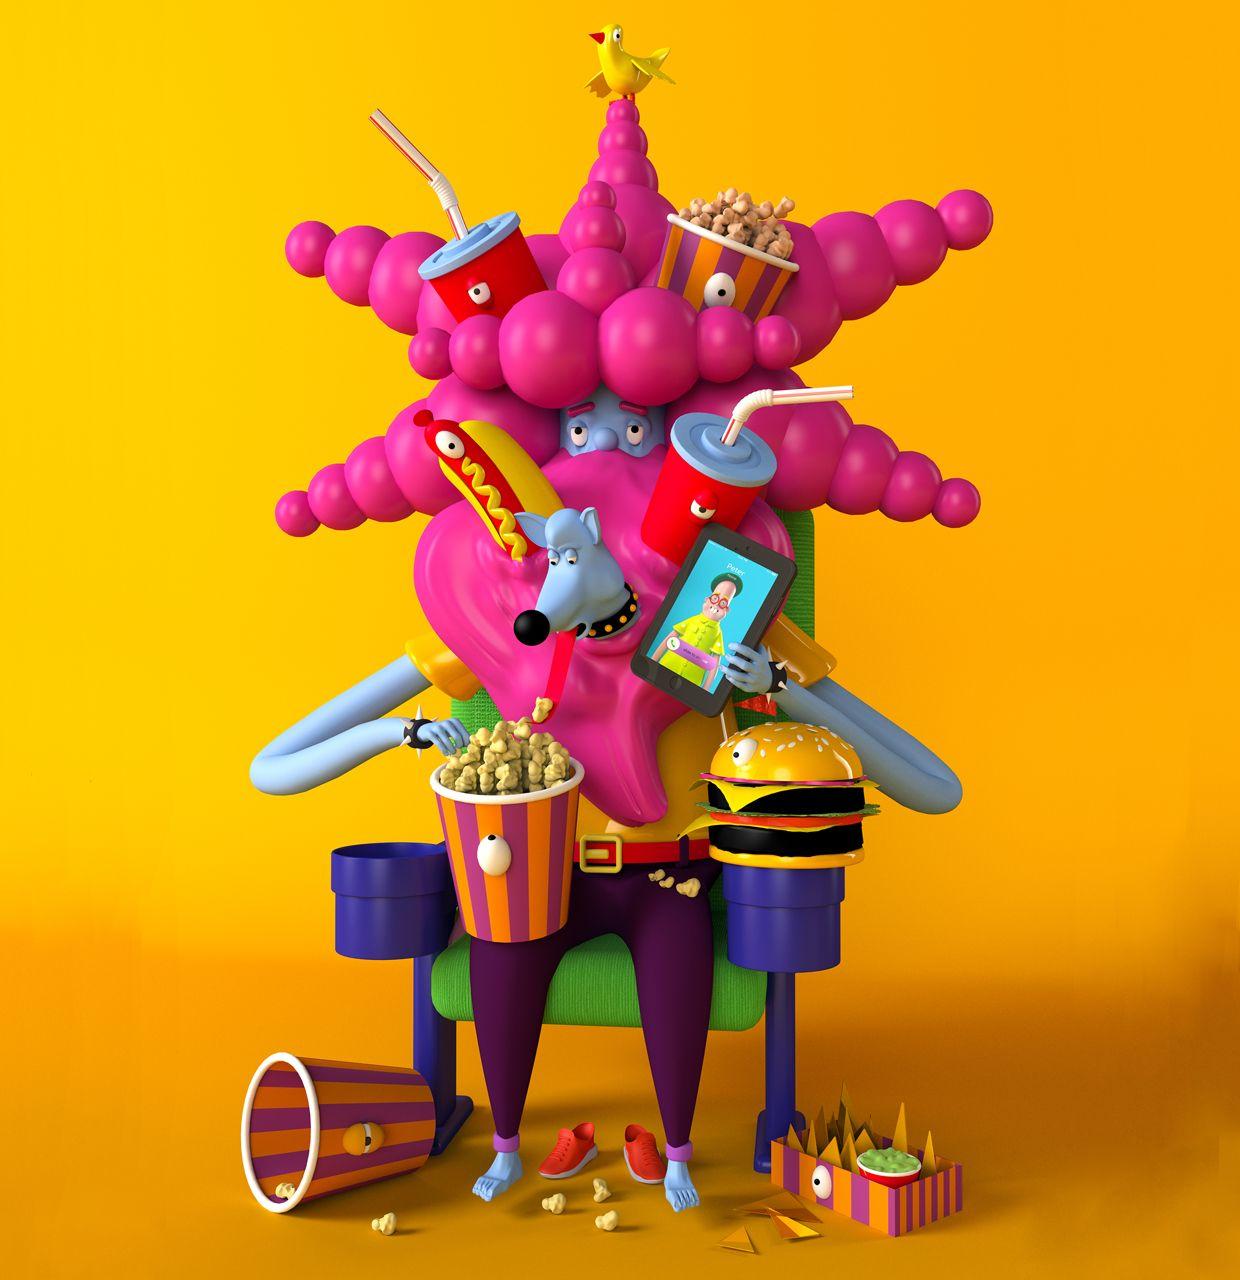 Design lad artist jelly london art toy design